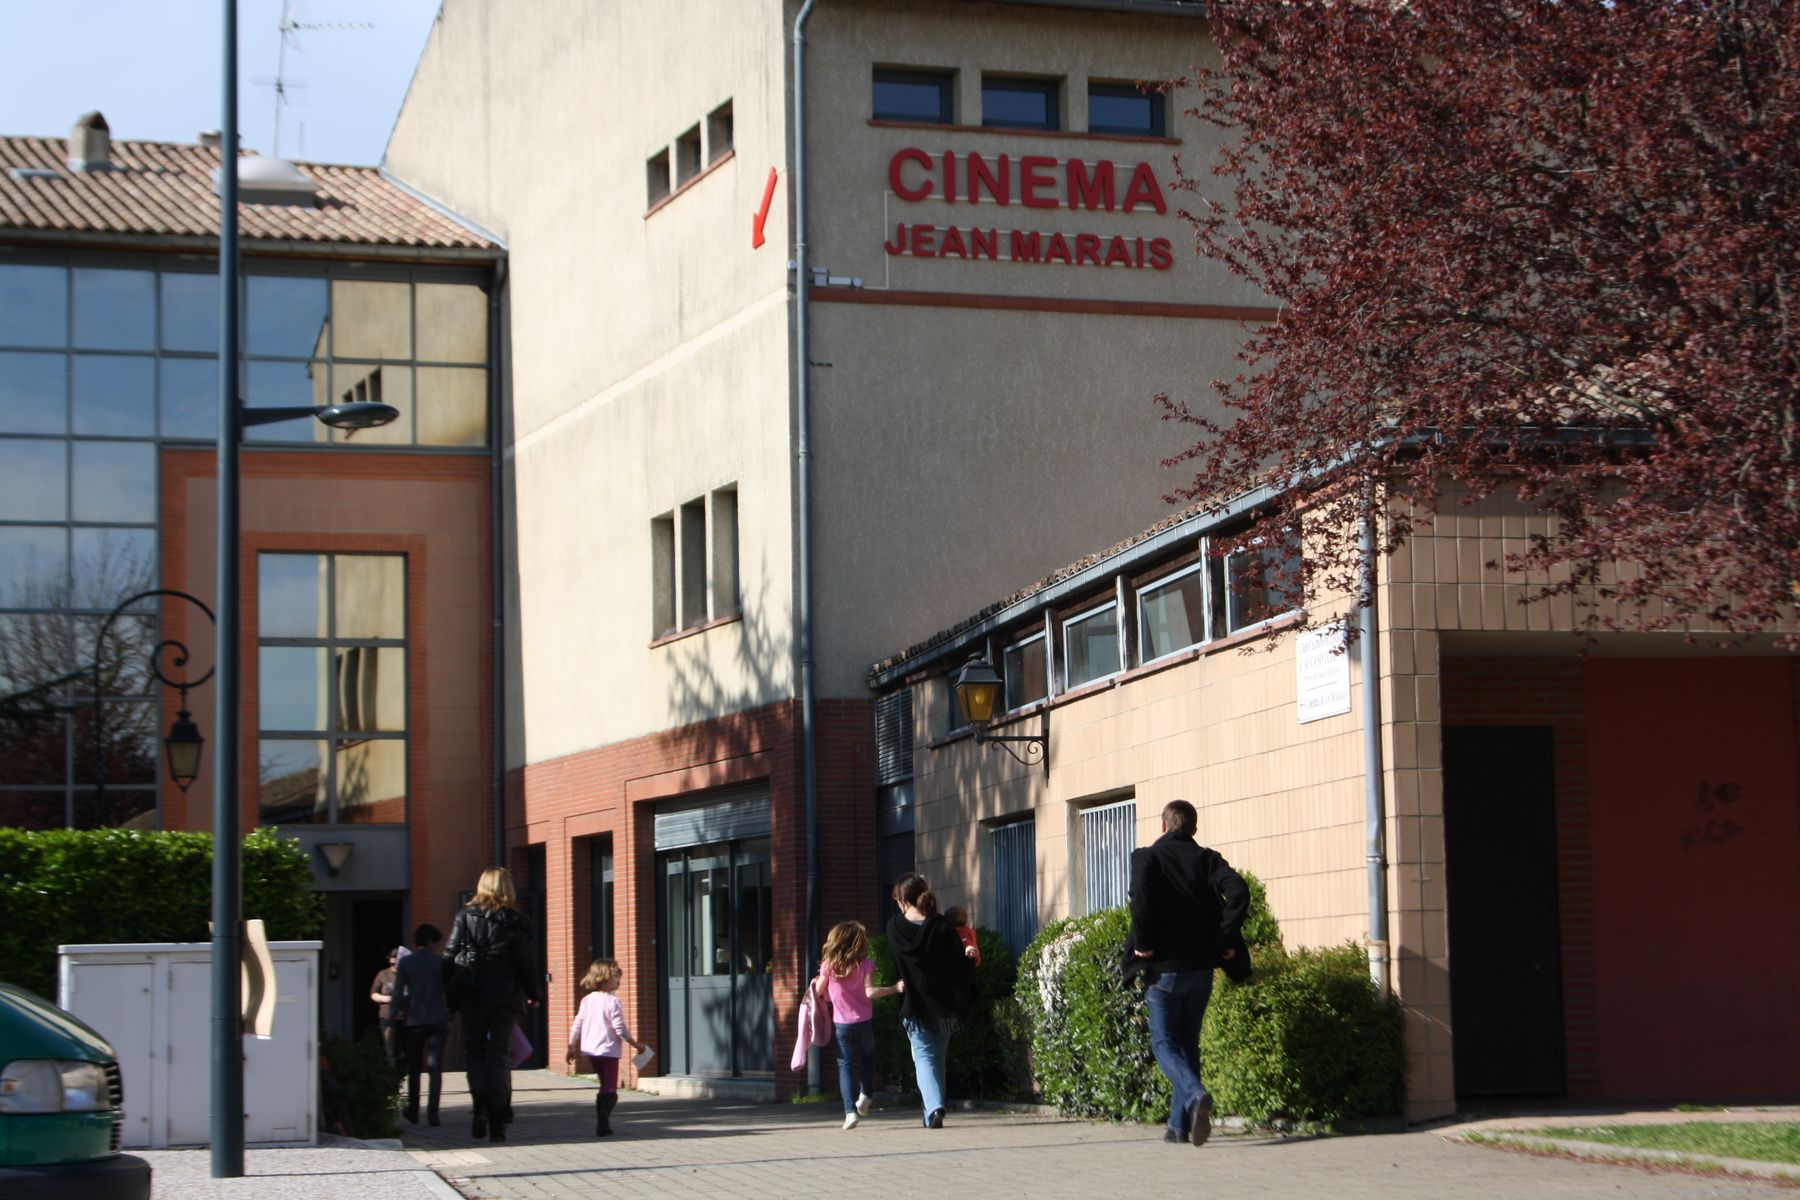 Centre culturel Alain Savary et cinéma Jean Marais